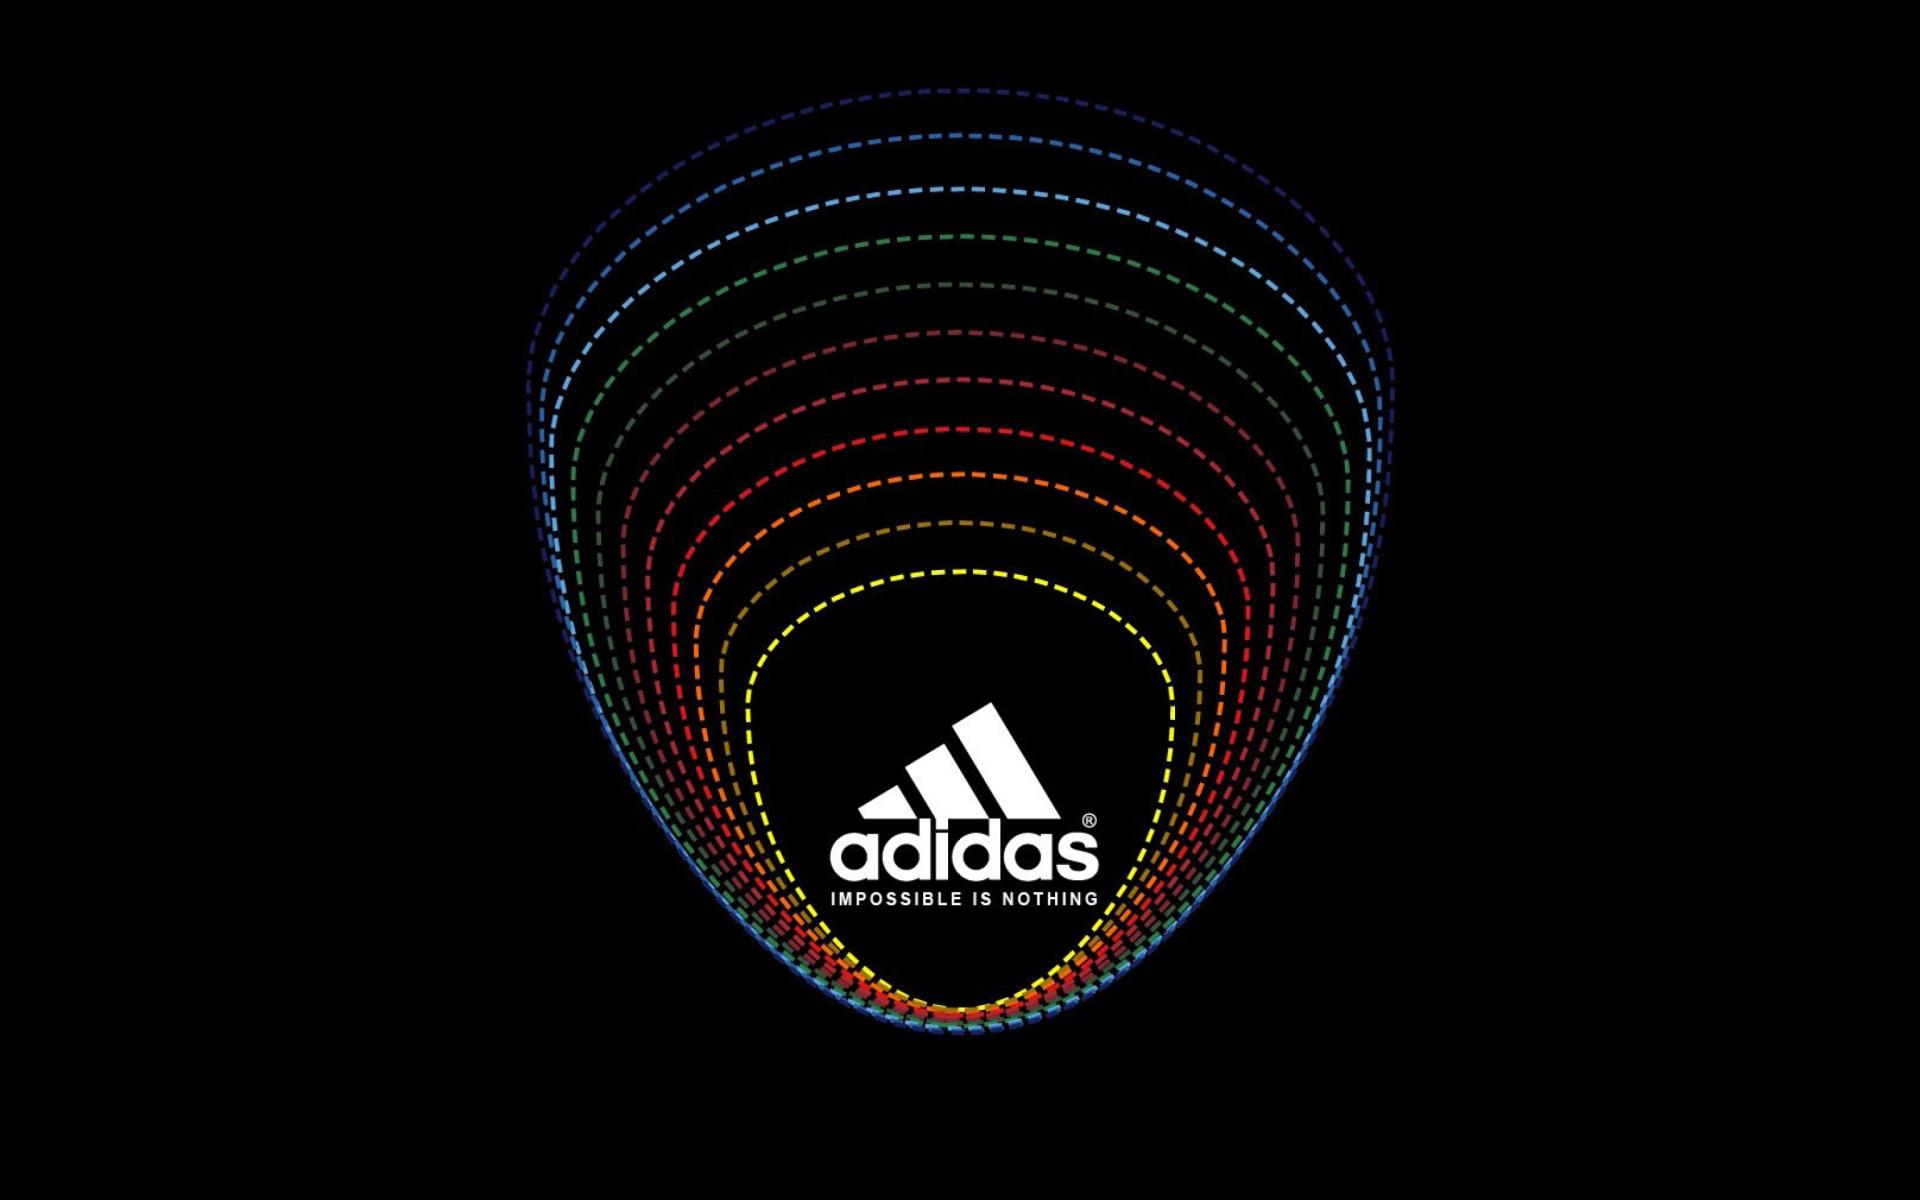 Index of wp contentuploadsimagenes adidas wallpapers imagenes adidas wall voltagebd Image collections